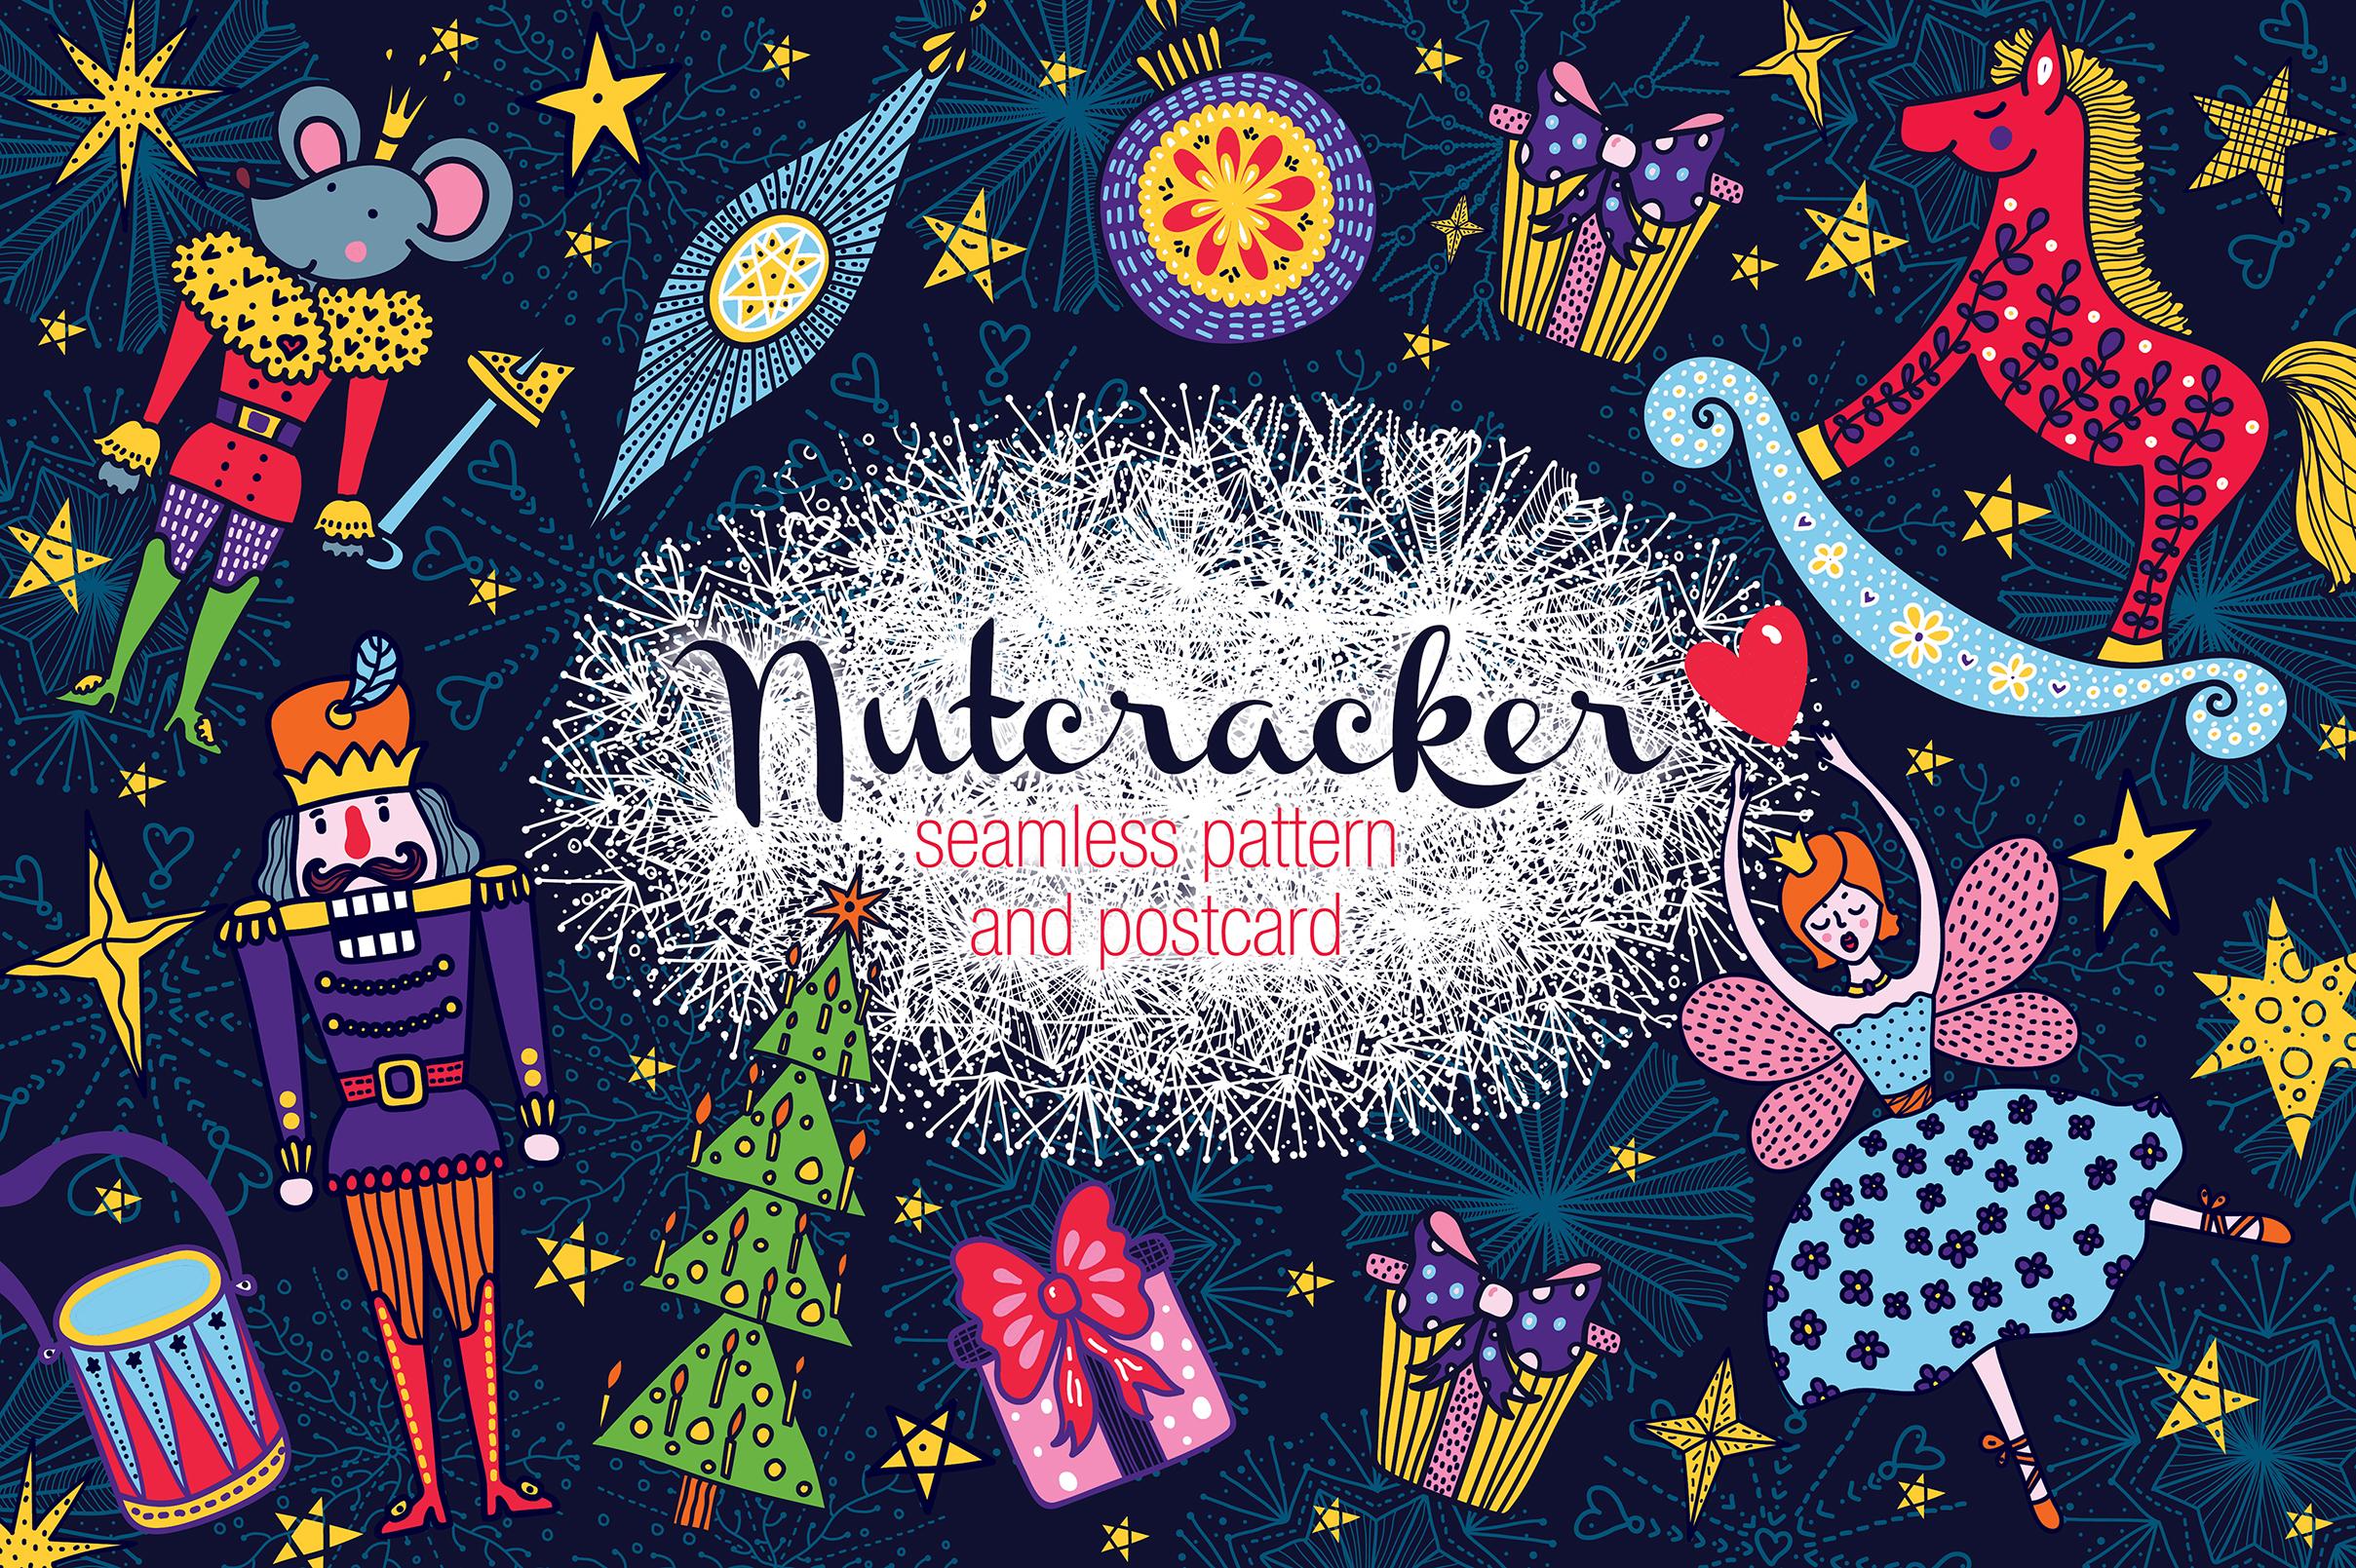 Nutcracker. Christmas story. example image 1